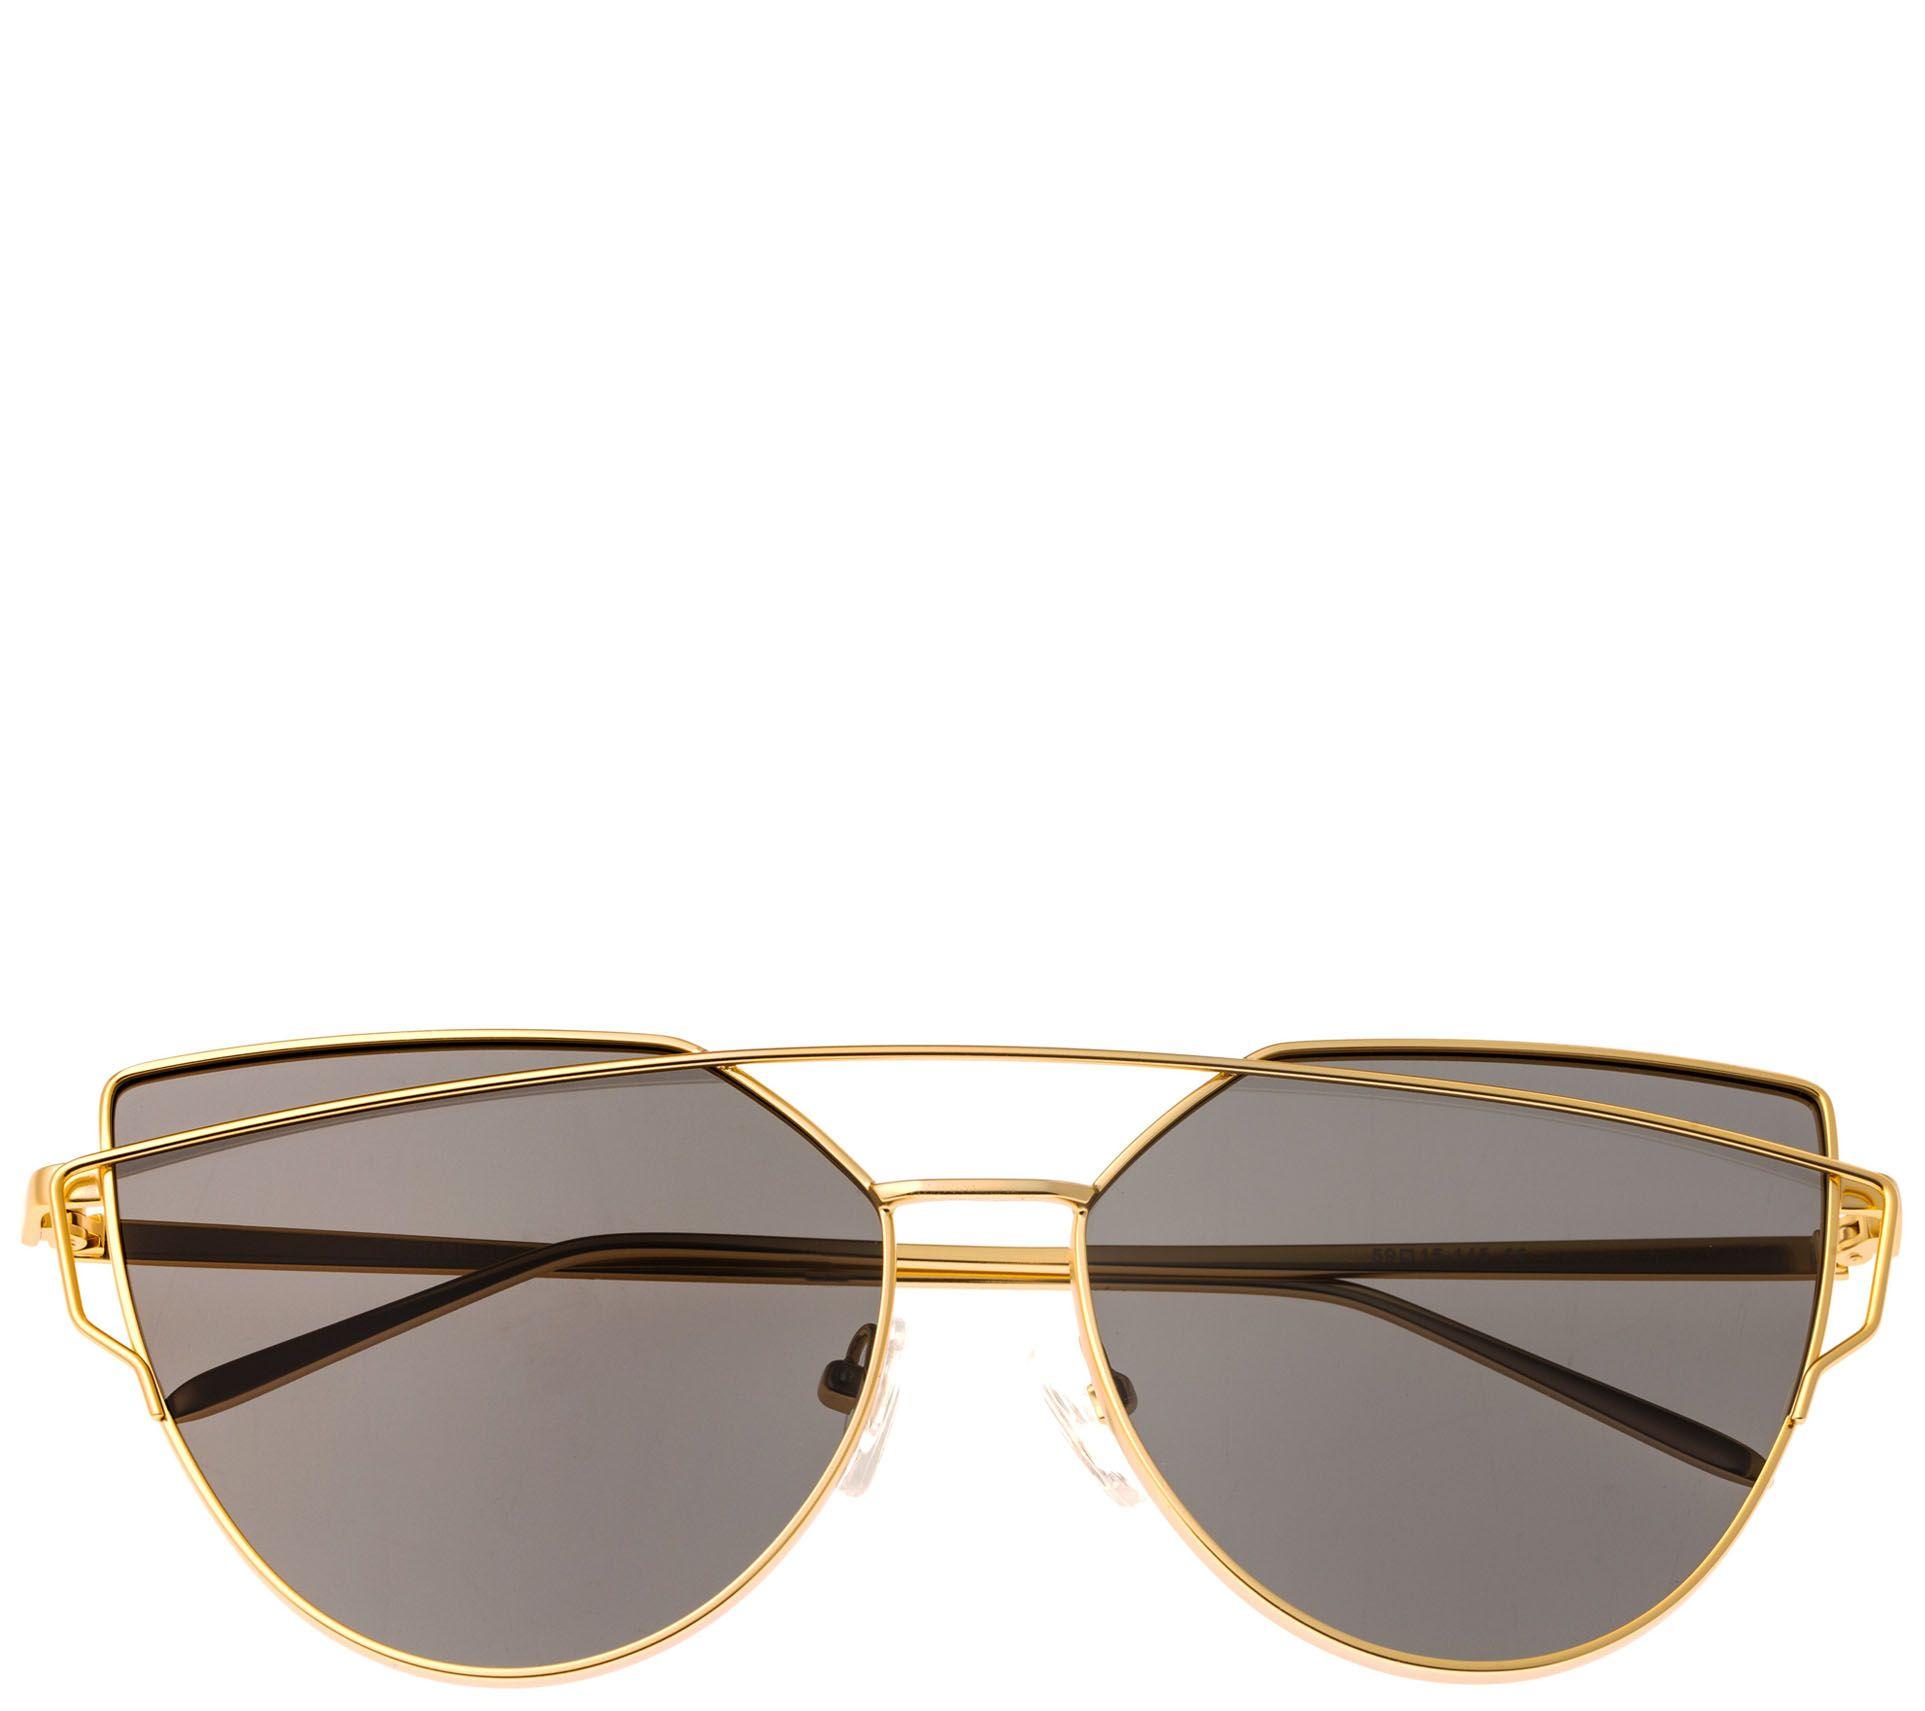 7b6d226f7c Bertha Aria Polarized Sunglasses - Page 1 — QVC.com